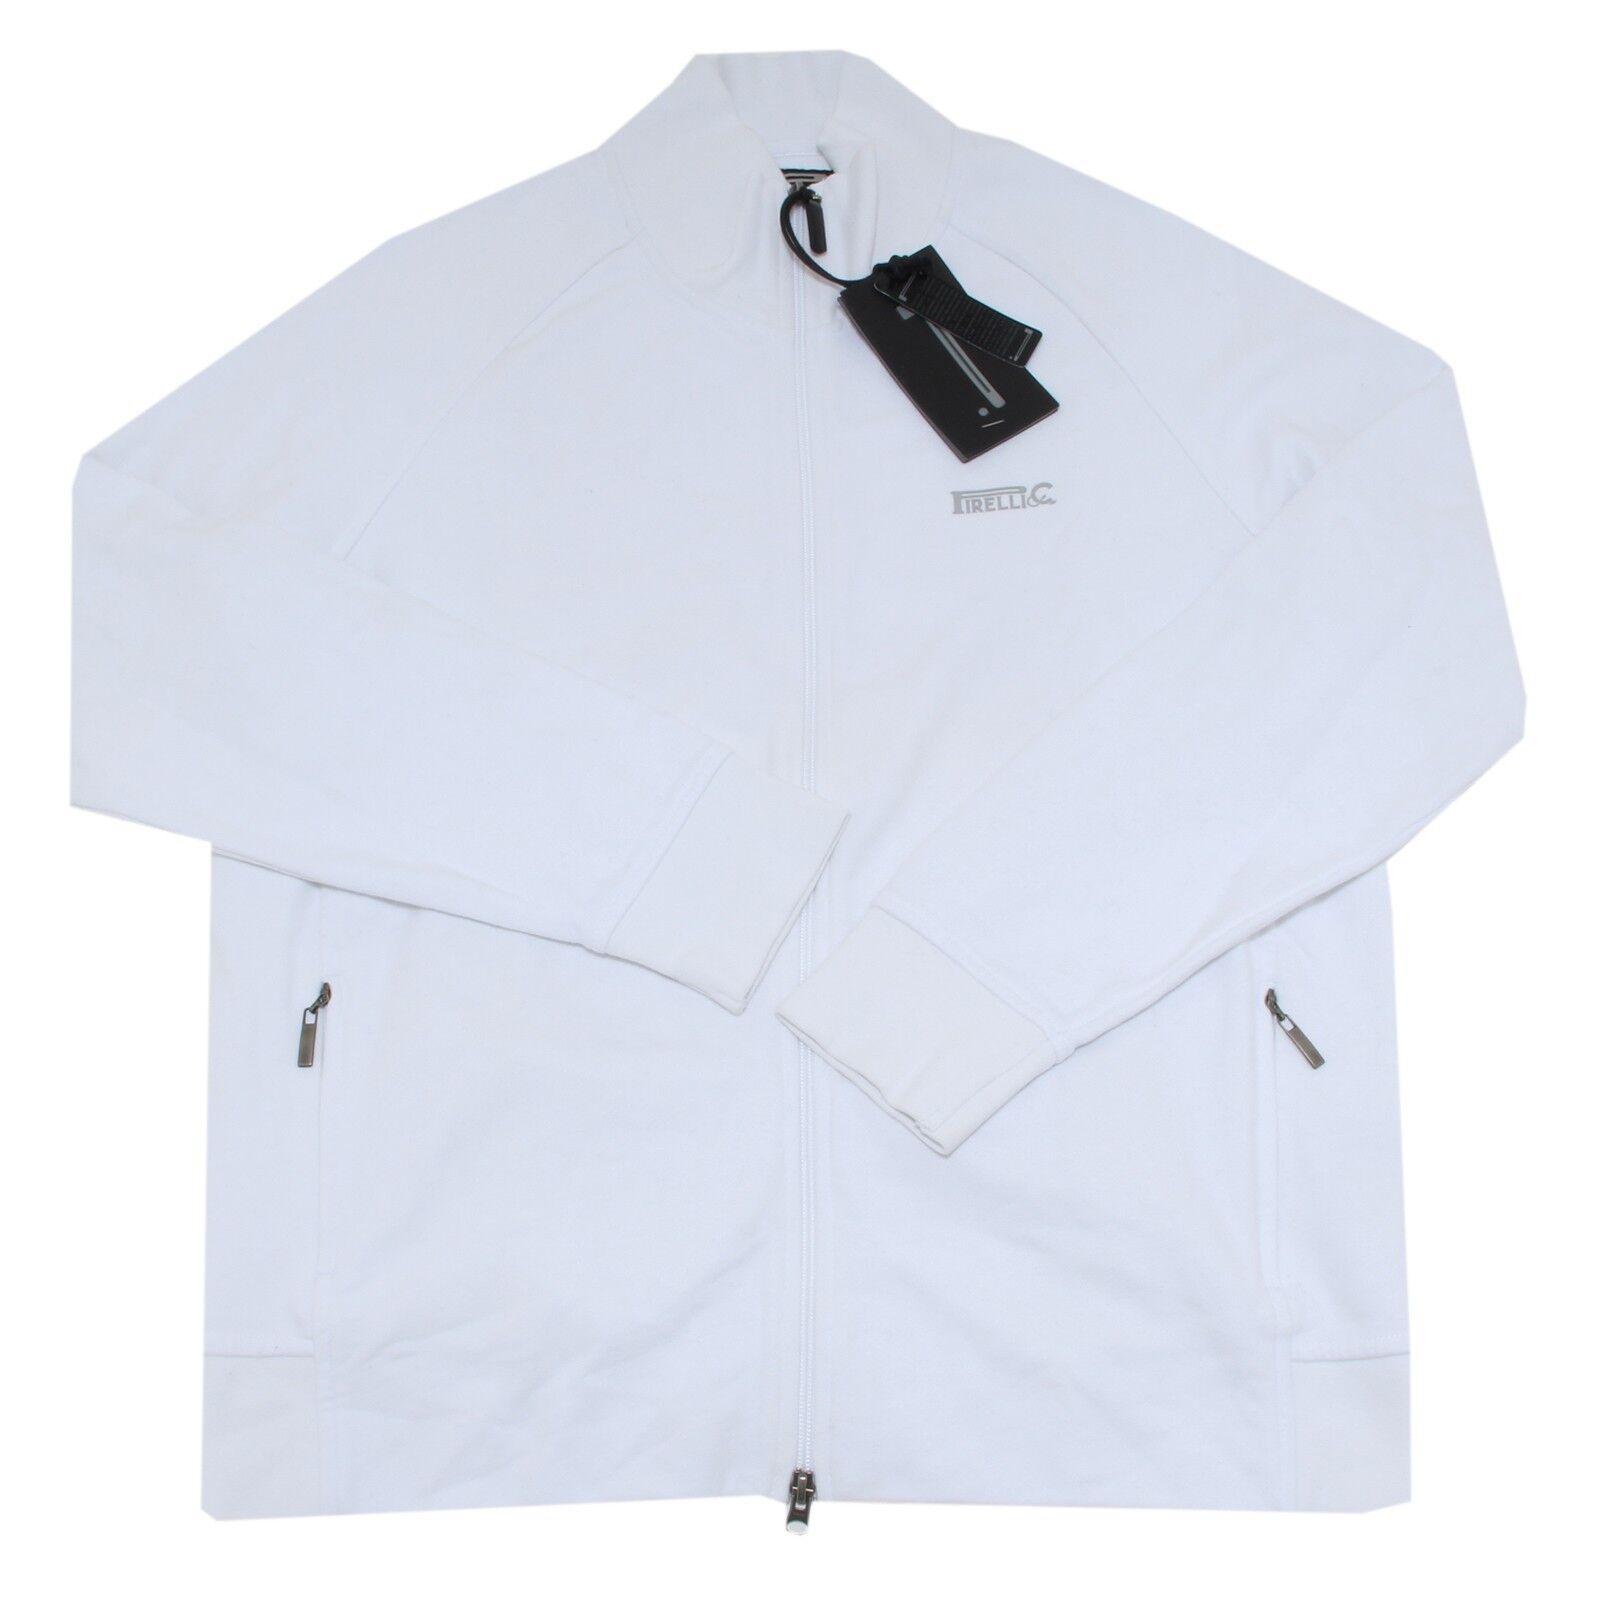 8703 uomo felpa PIRELLI uomo 8703 sweatshirt Uomo 10f45c